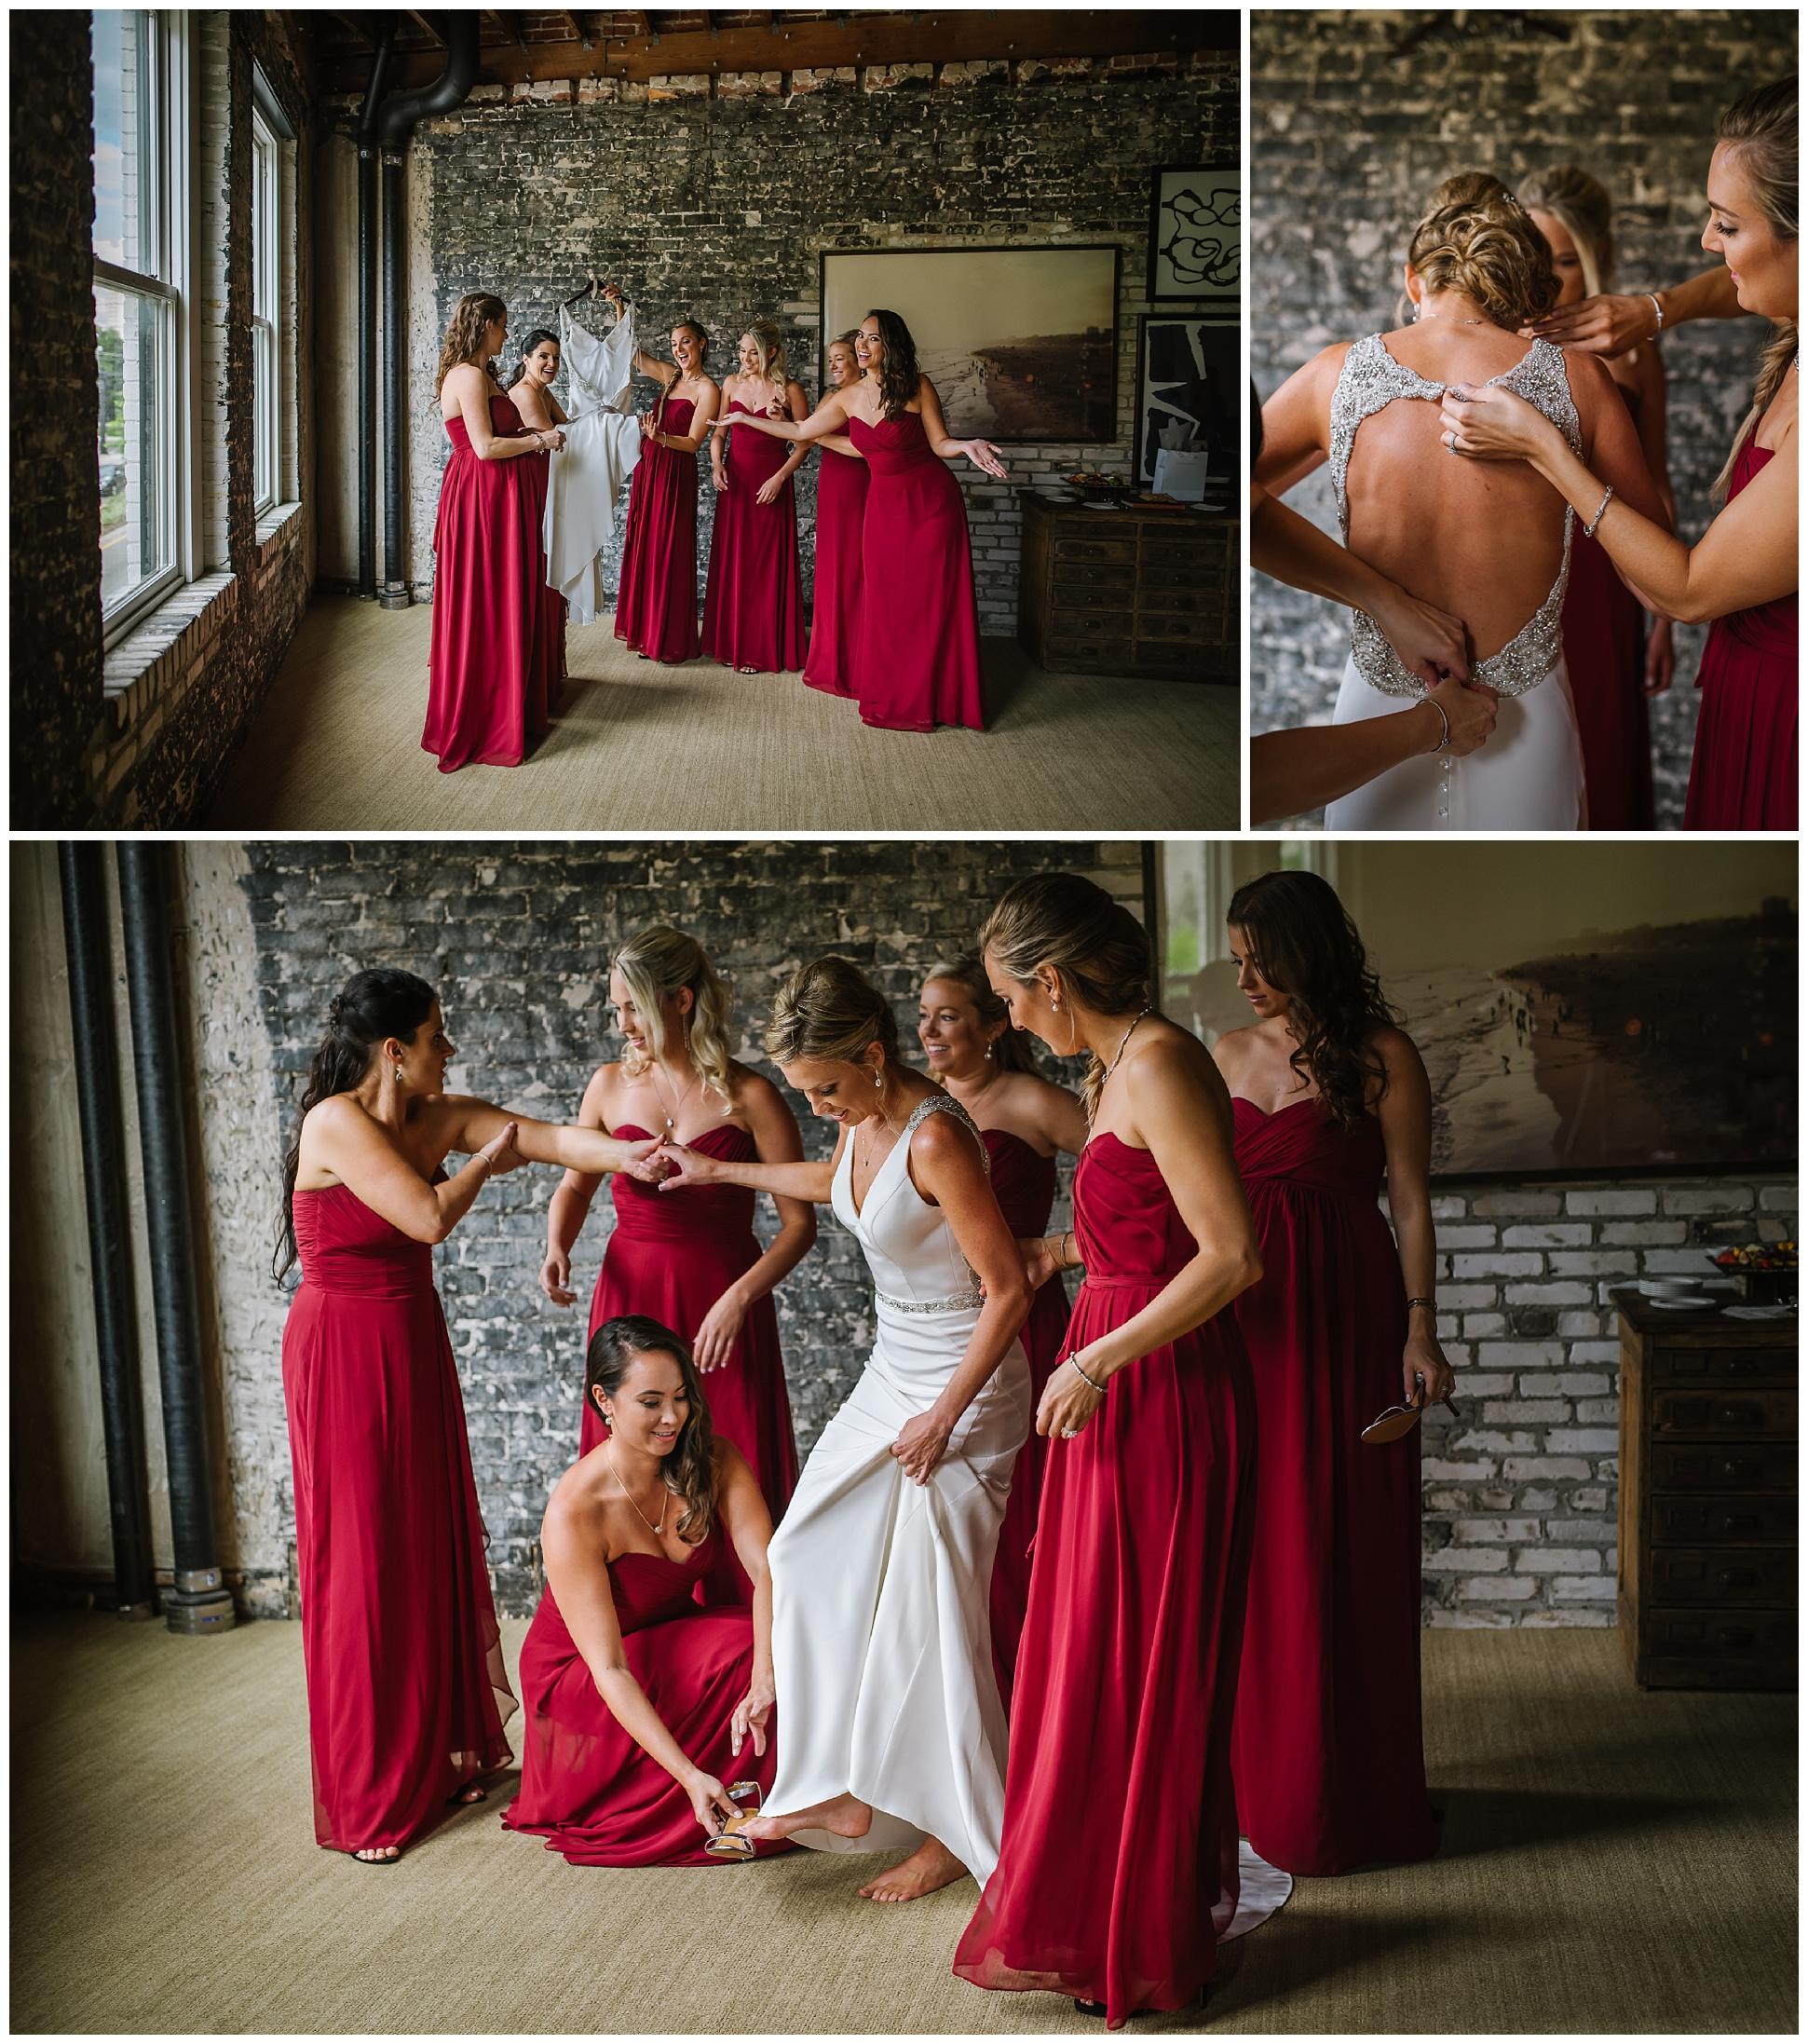 Oxford-exchange-wedding-photogapher-garland-candels-bookstore-burgandy-botanica_0009.jpg